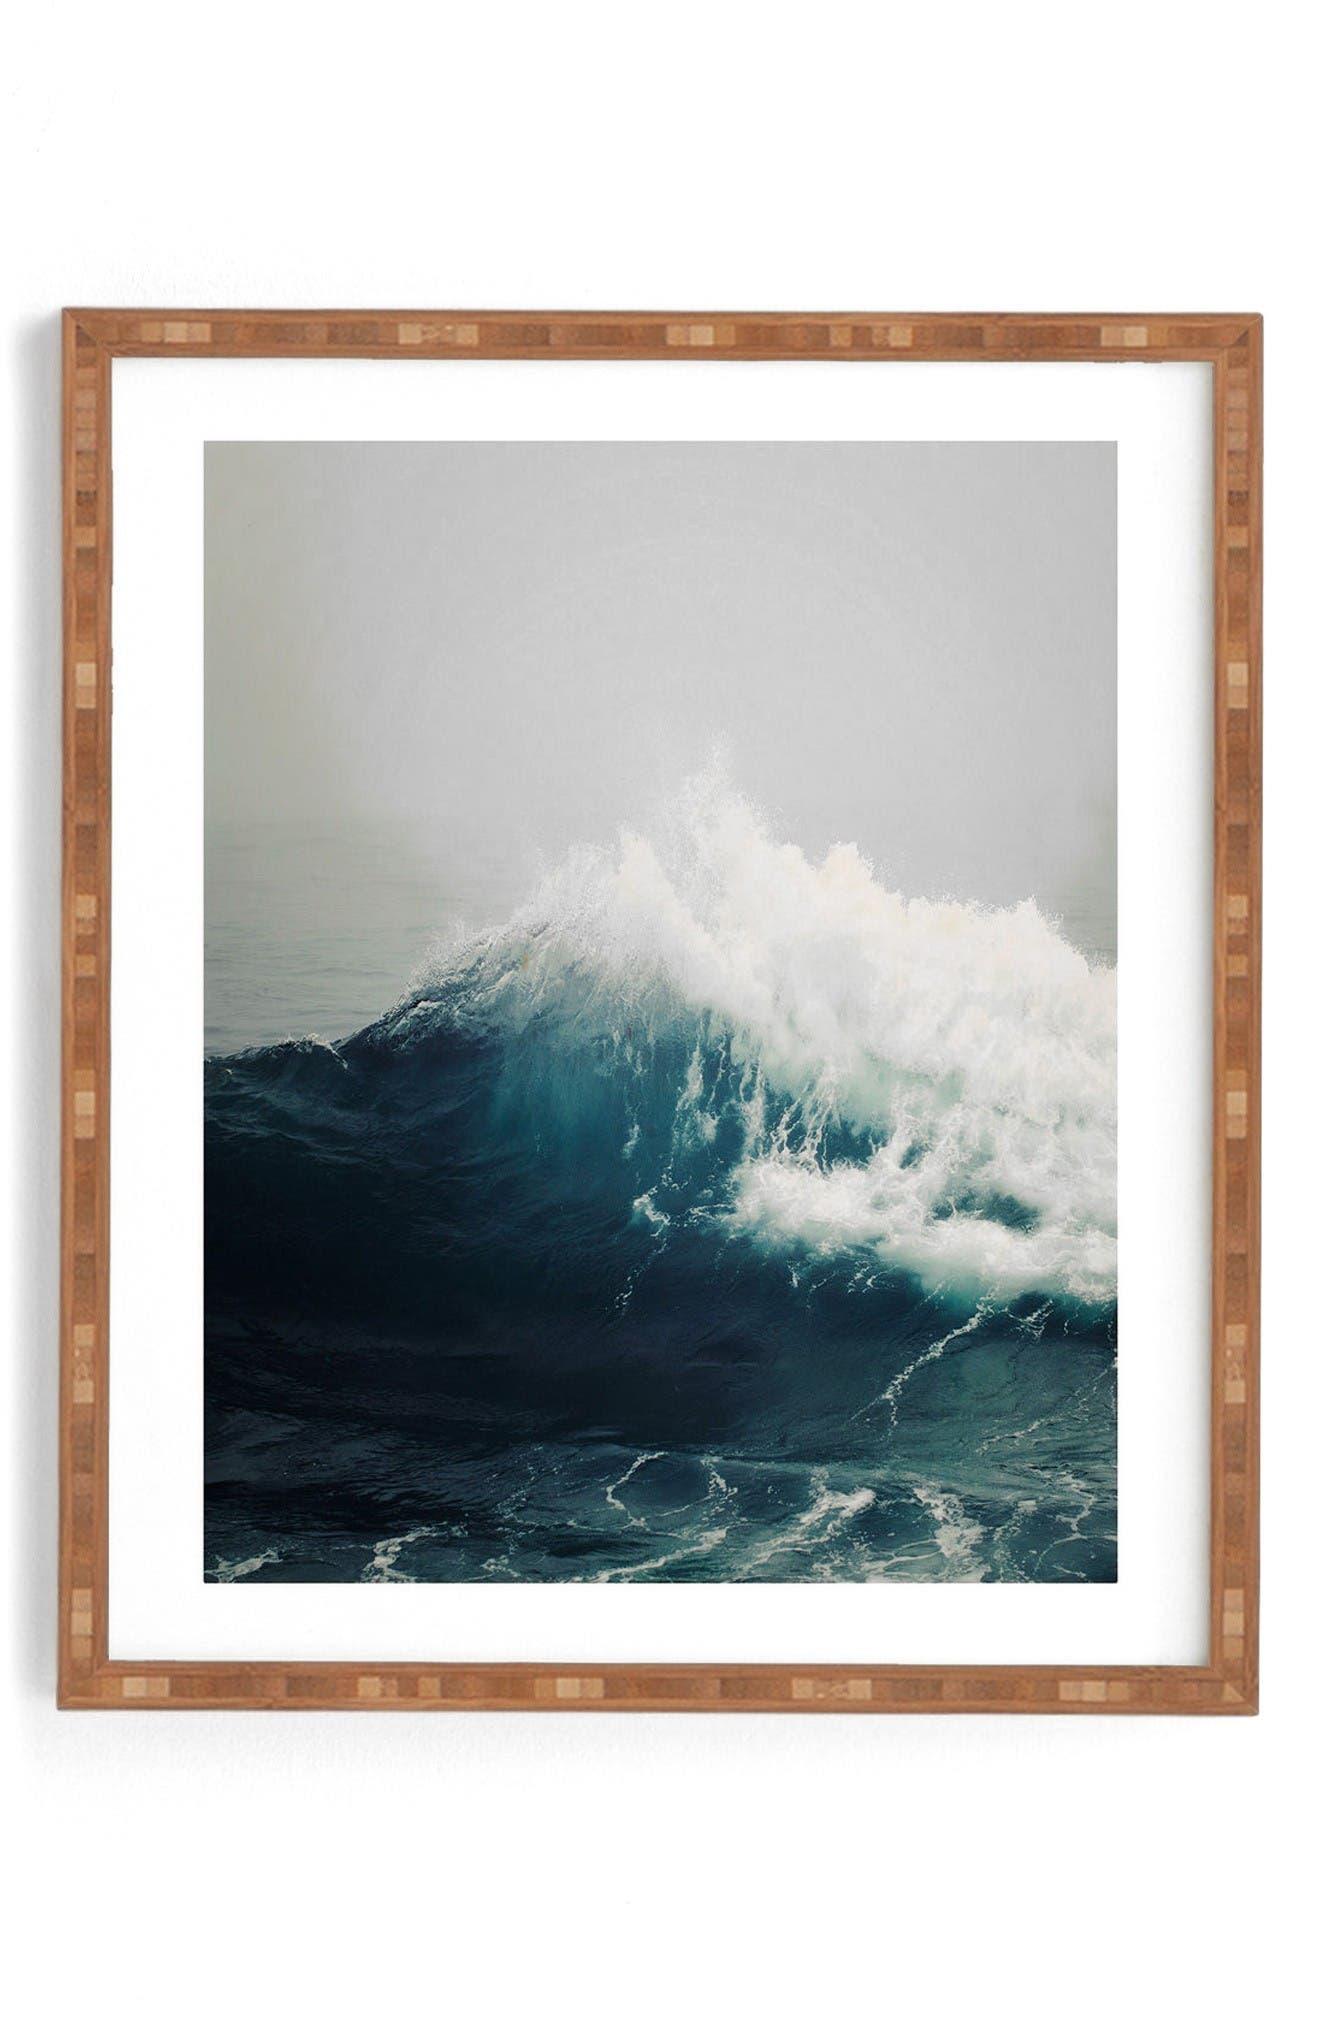 Main Image - DENY Designs Sea Wave Framed Wall Art